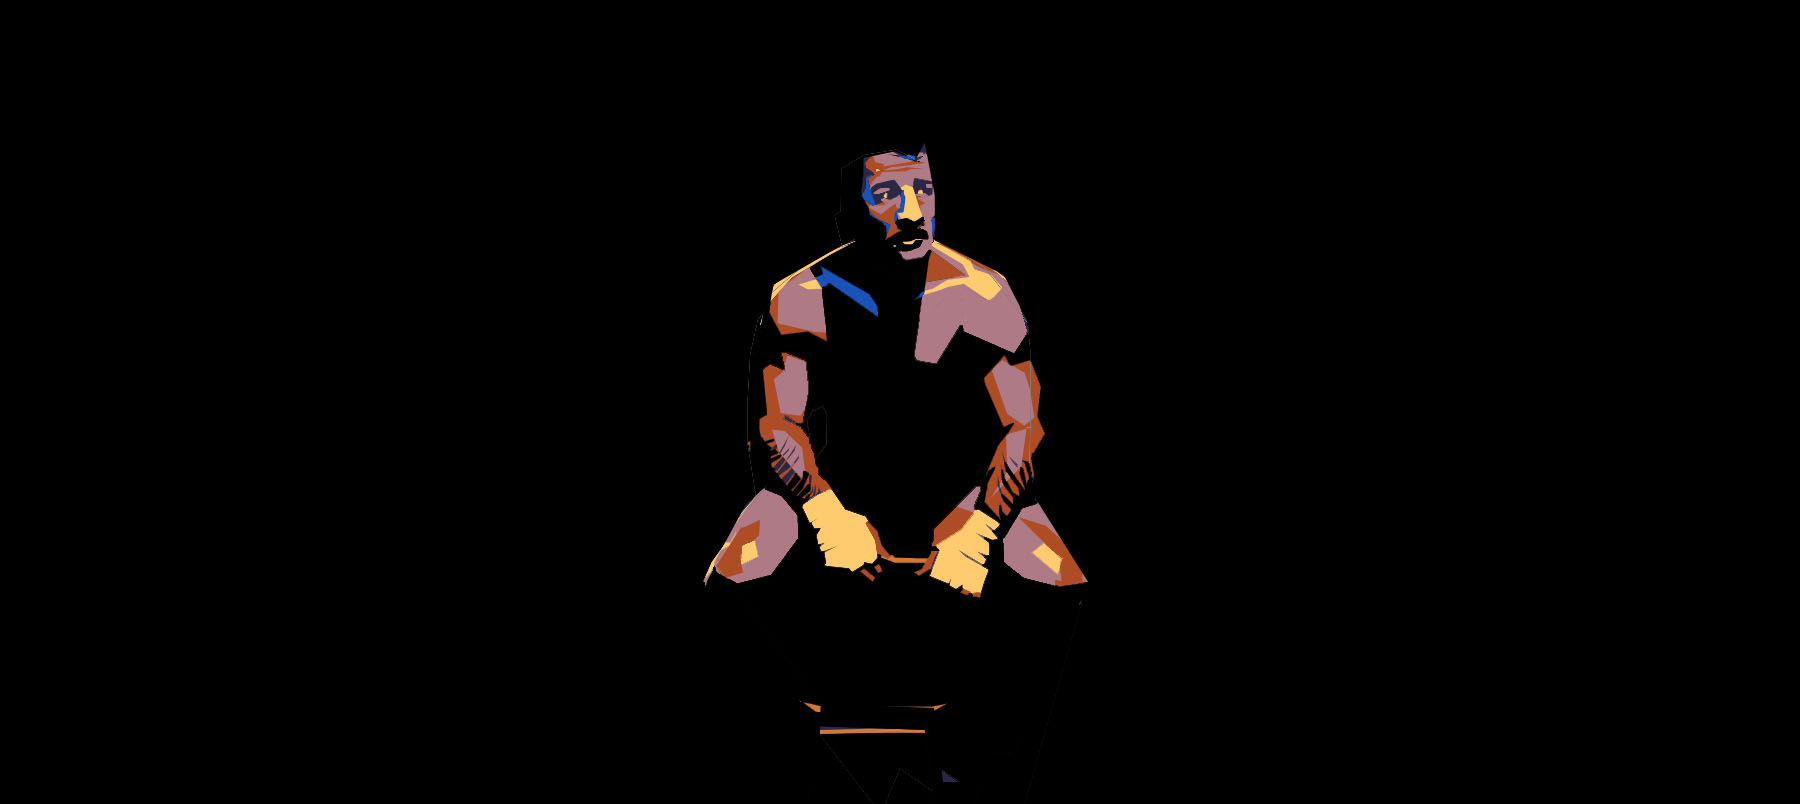 Untitled (Boxer) (Stanley Kubrick)